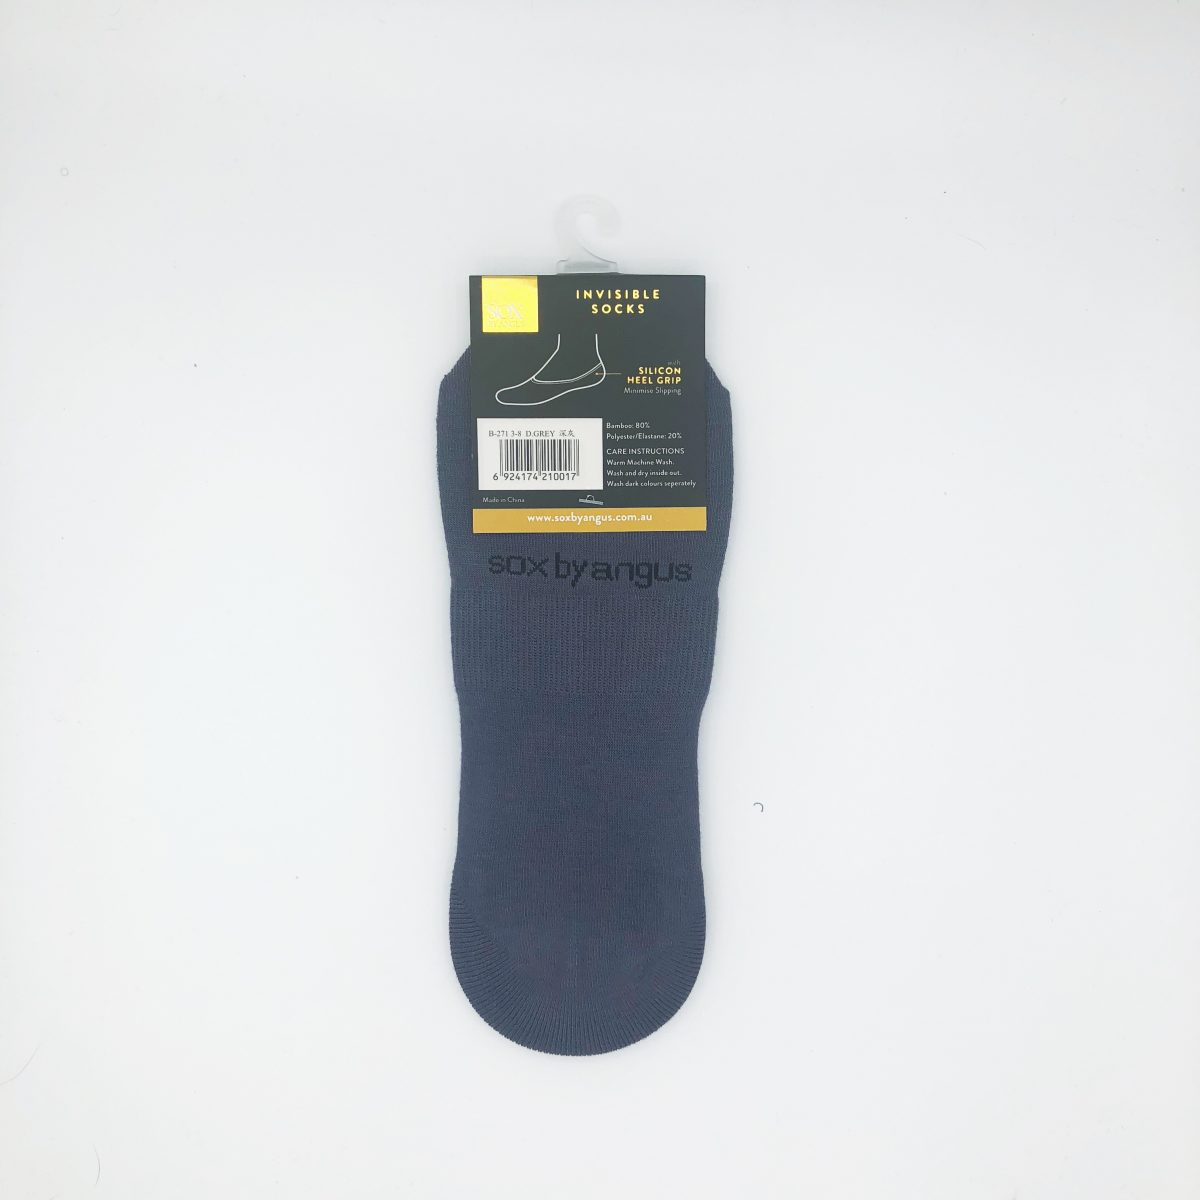 Bamboo invisible socks-hight cut-Gray